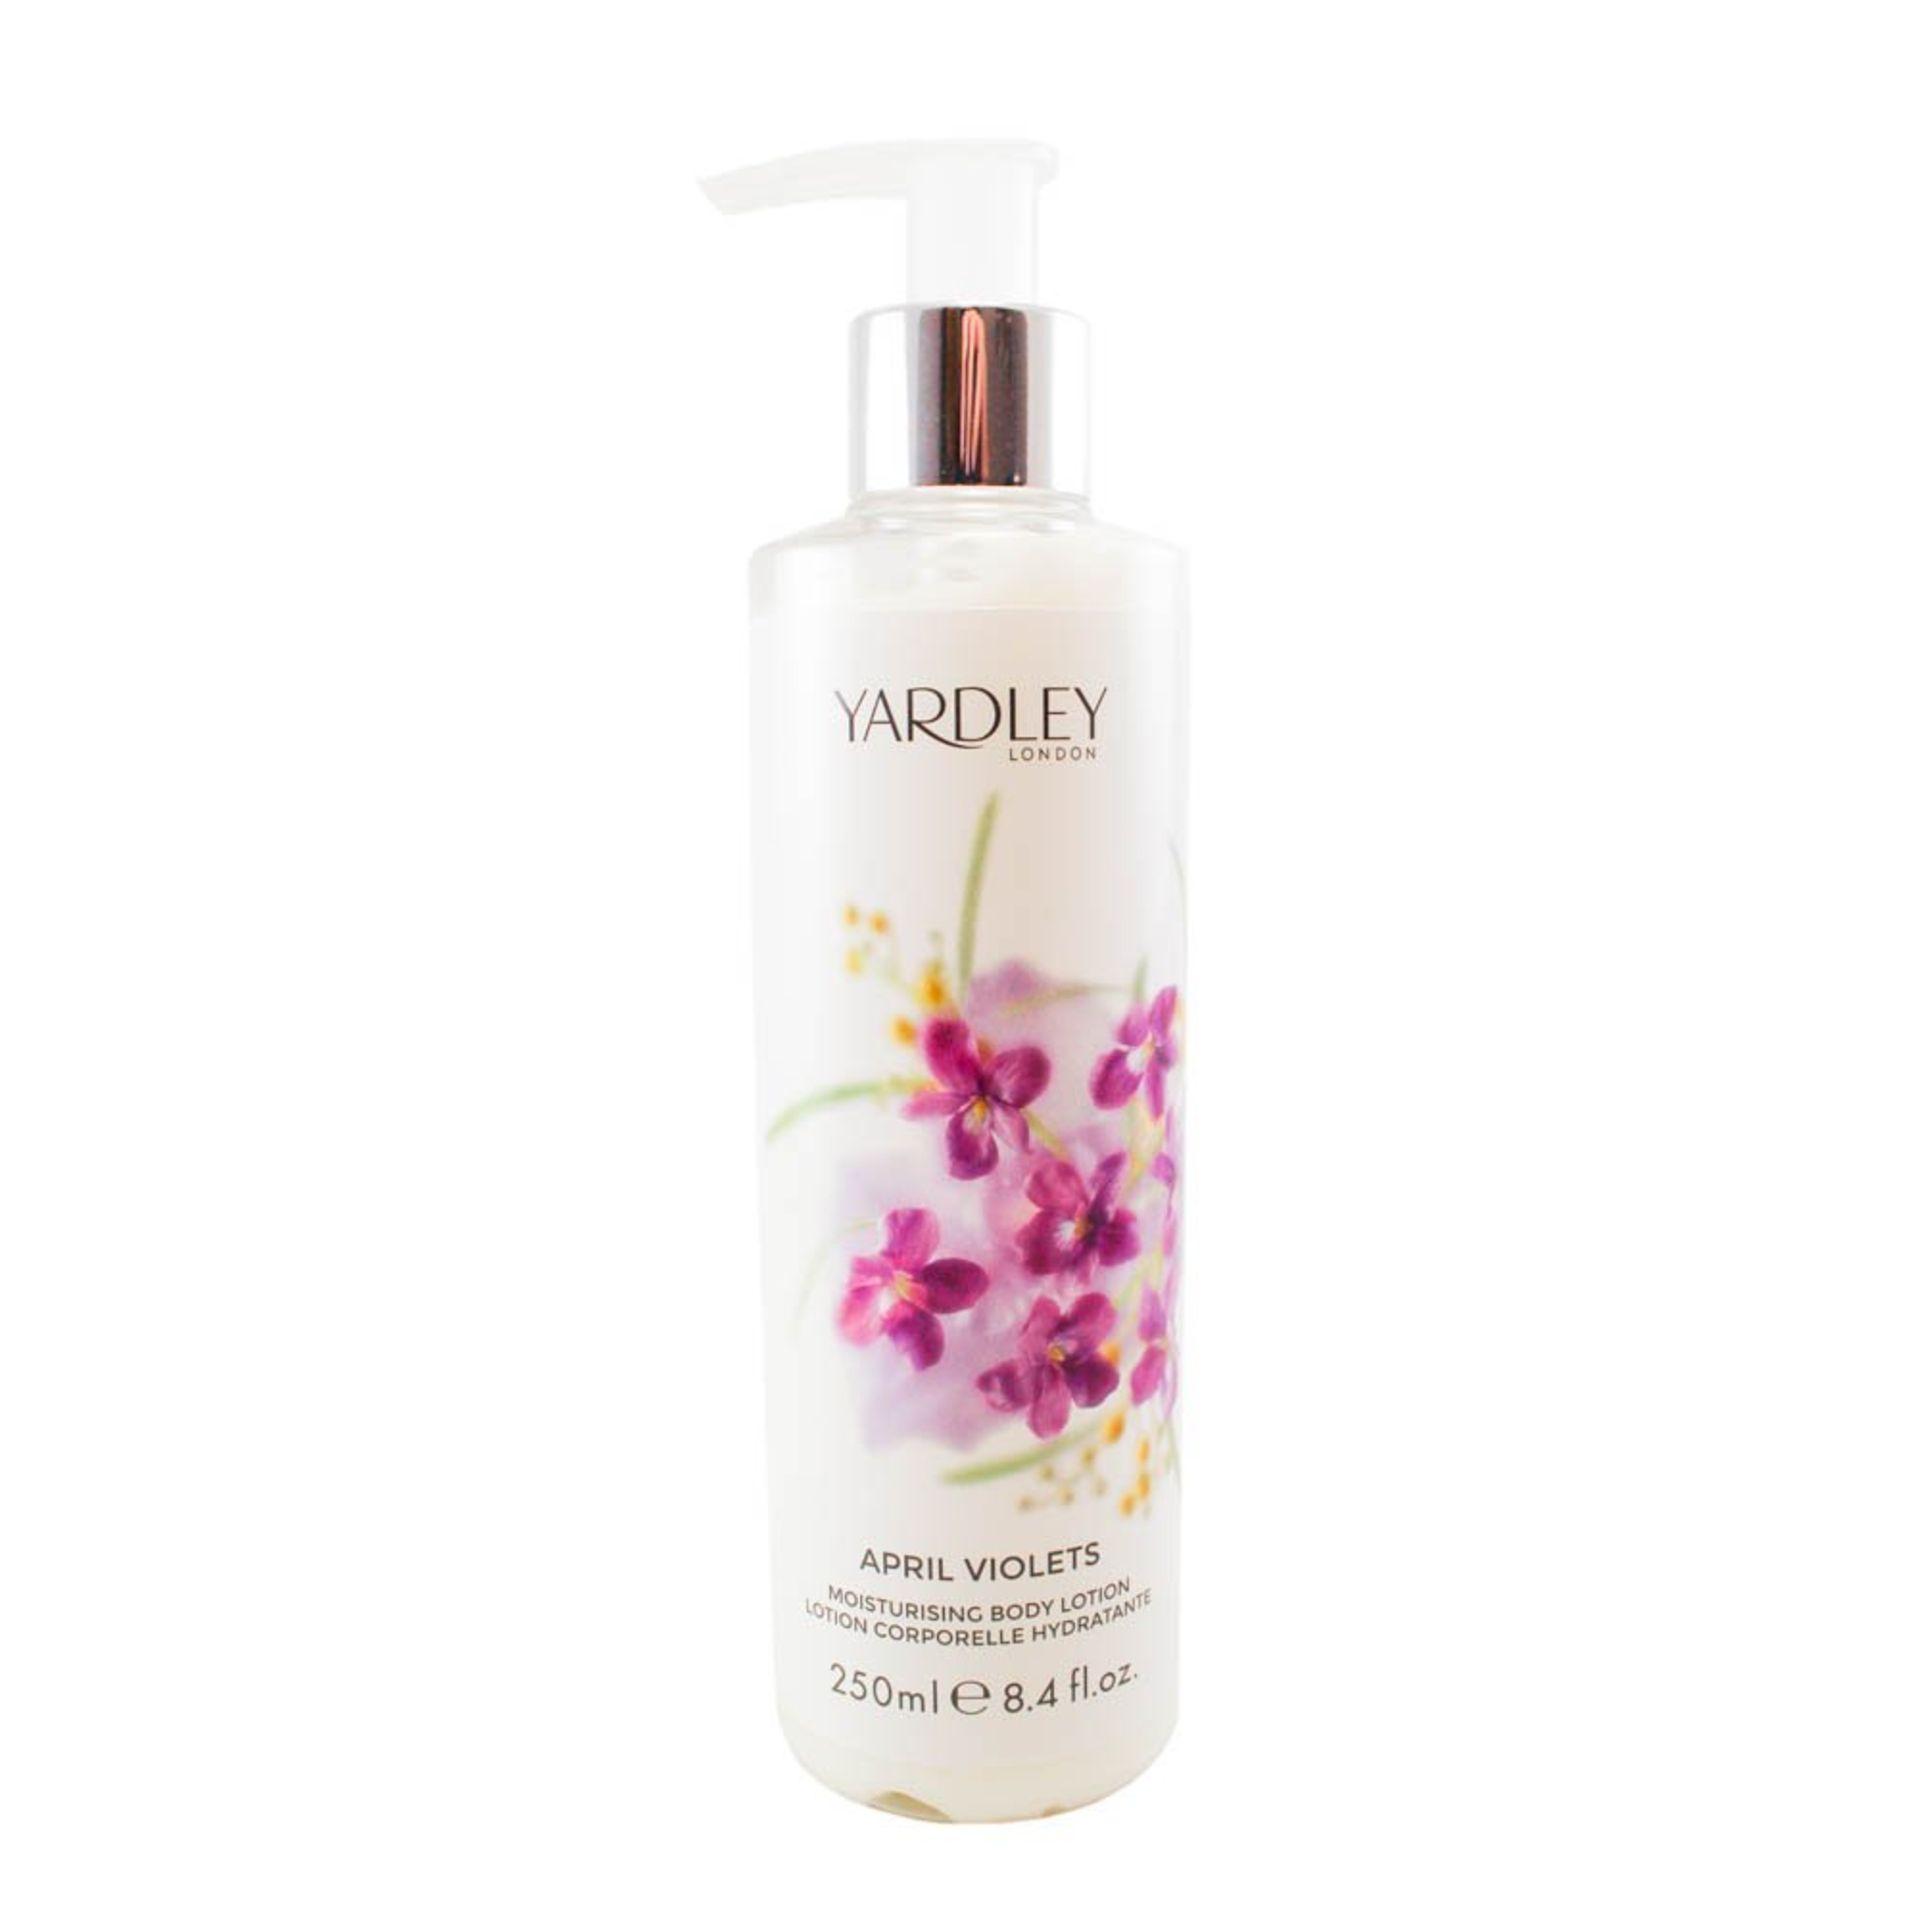 + VAT Brand New Yardley April Violets 250ml Body Lotion